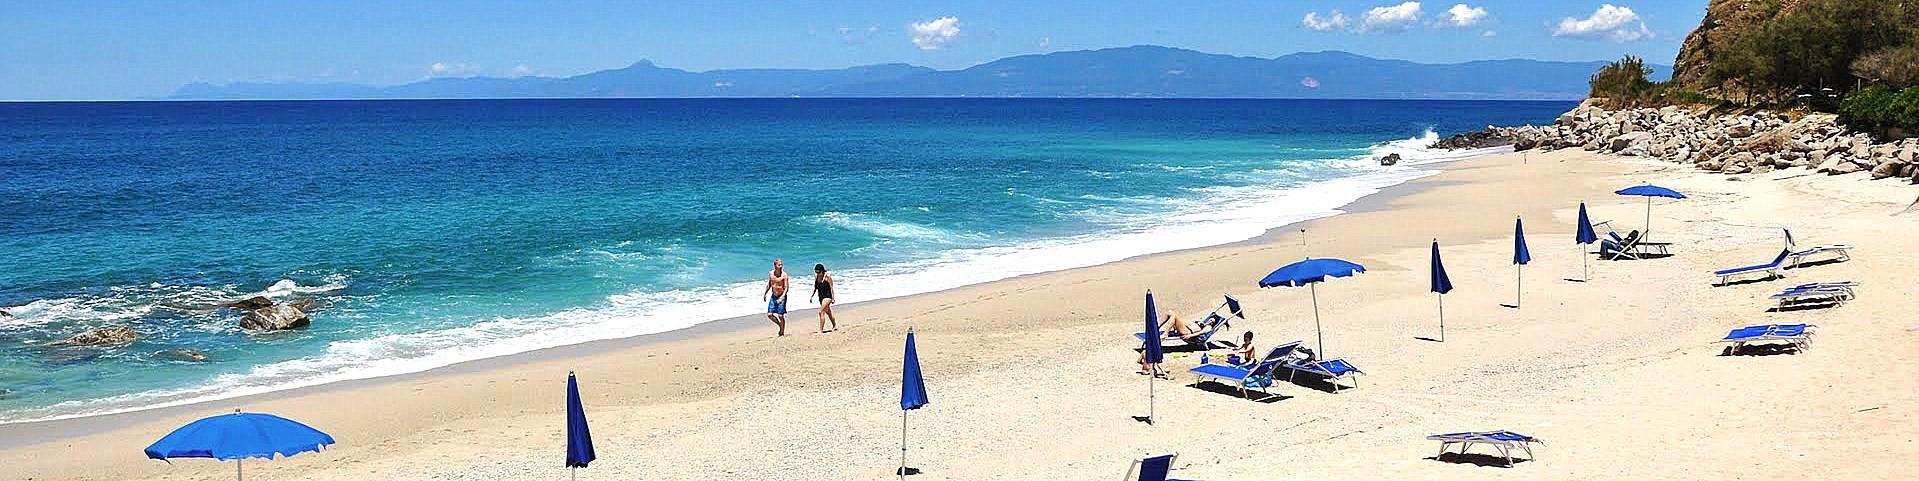 Briatico, pláž Lido San Giuseppe a výhled až na vzdálené kalábrijské Apeniny